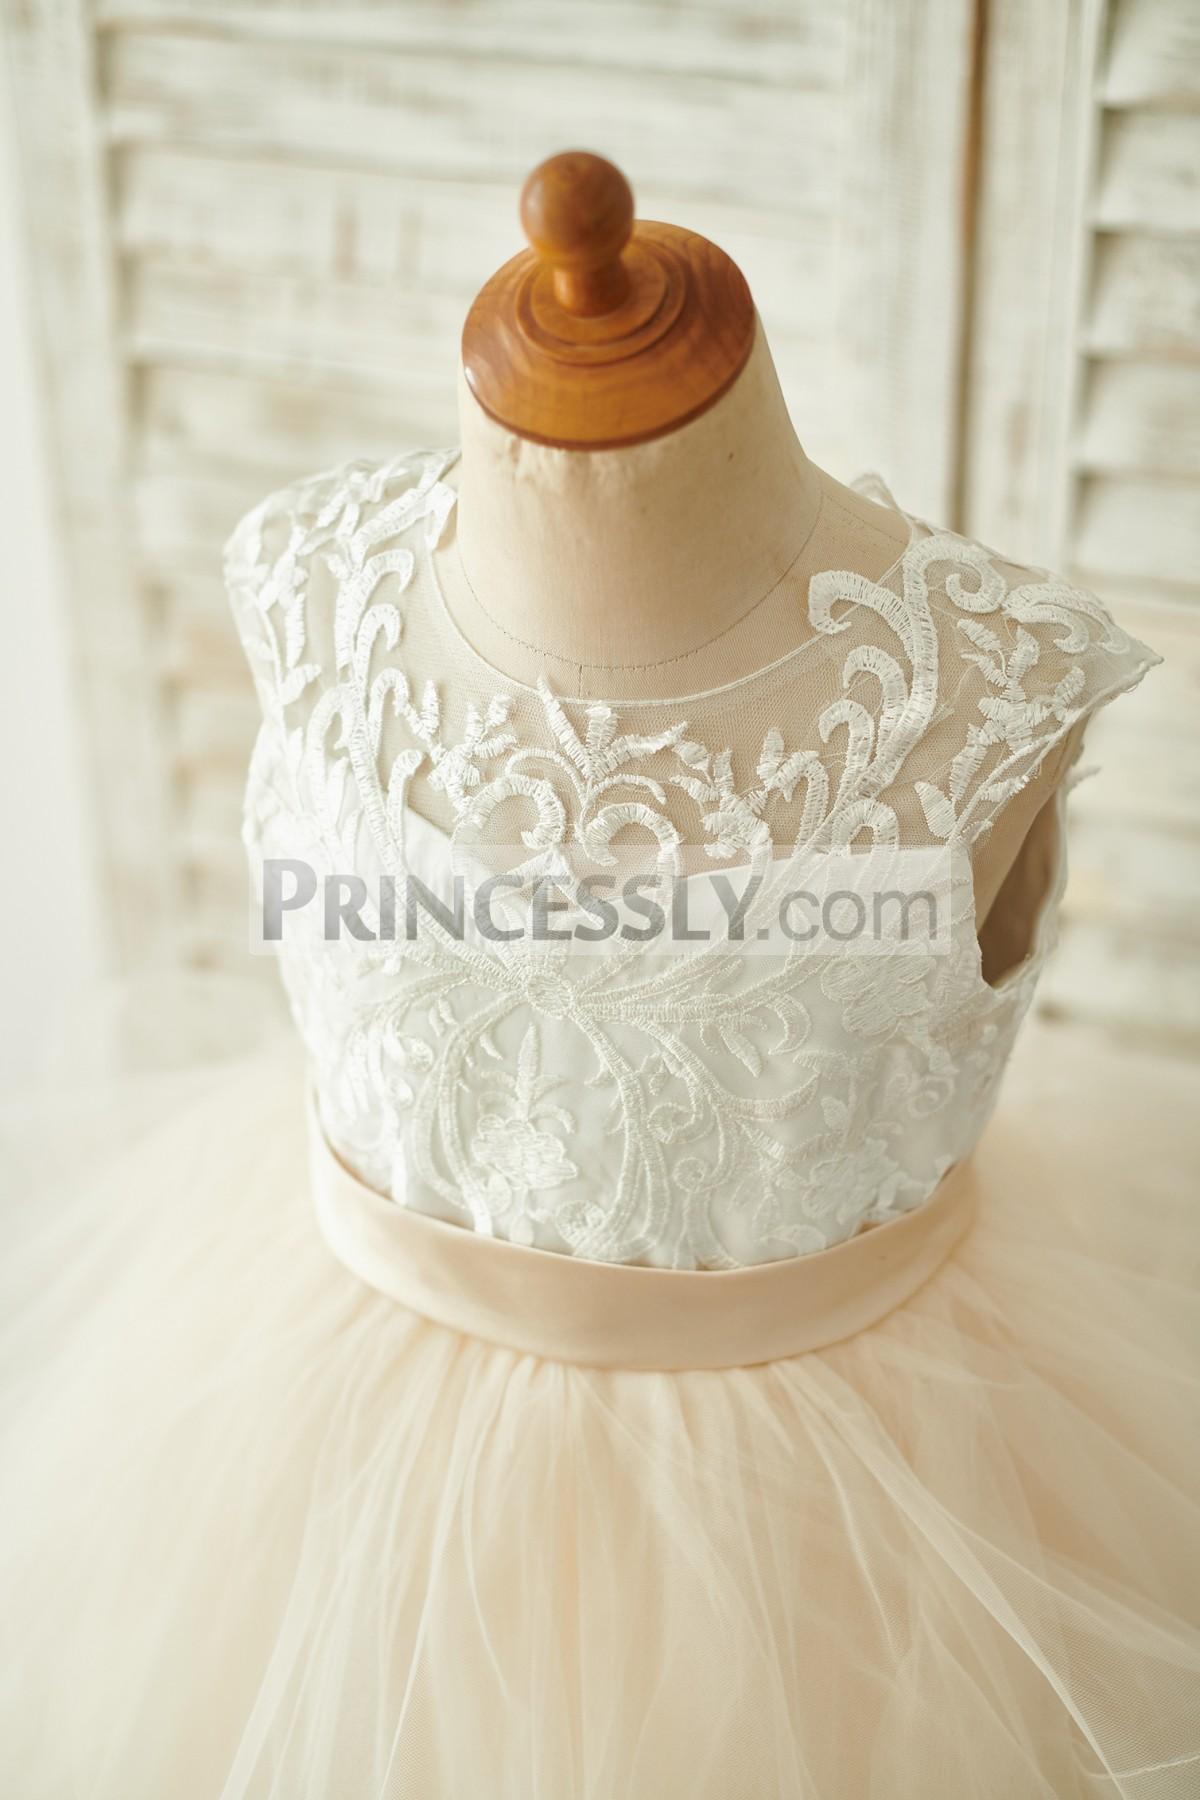 Sleeveless, Jewel Neck with Inside Sweetheart Neckline Ivory Lace Bodice